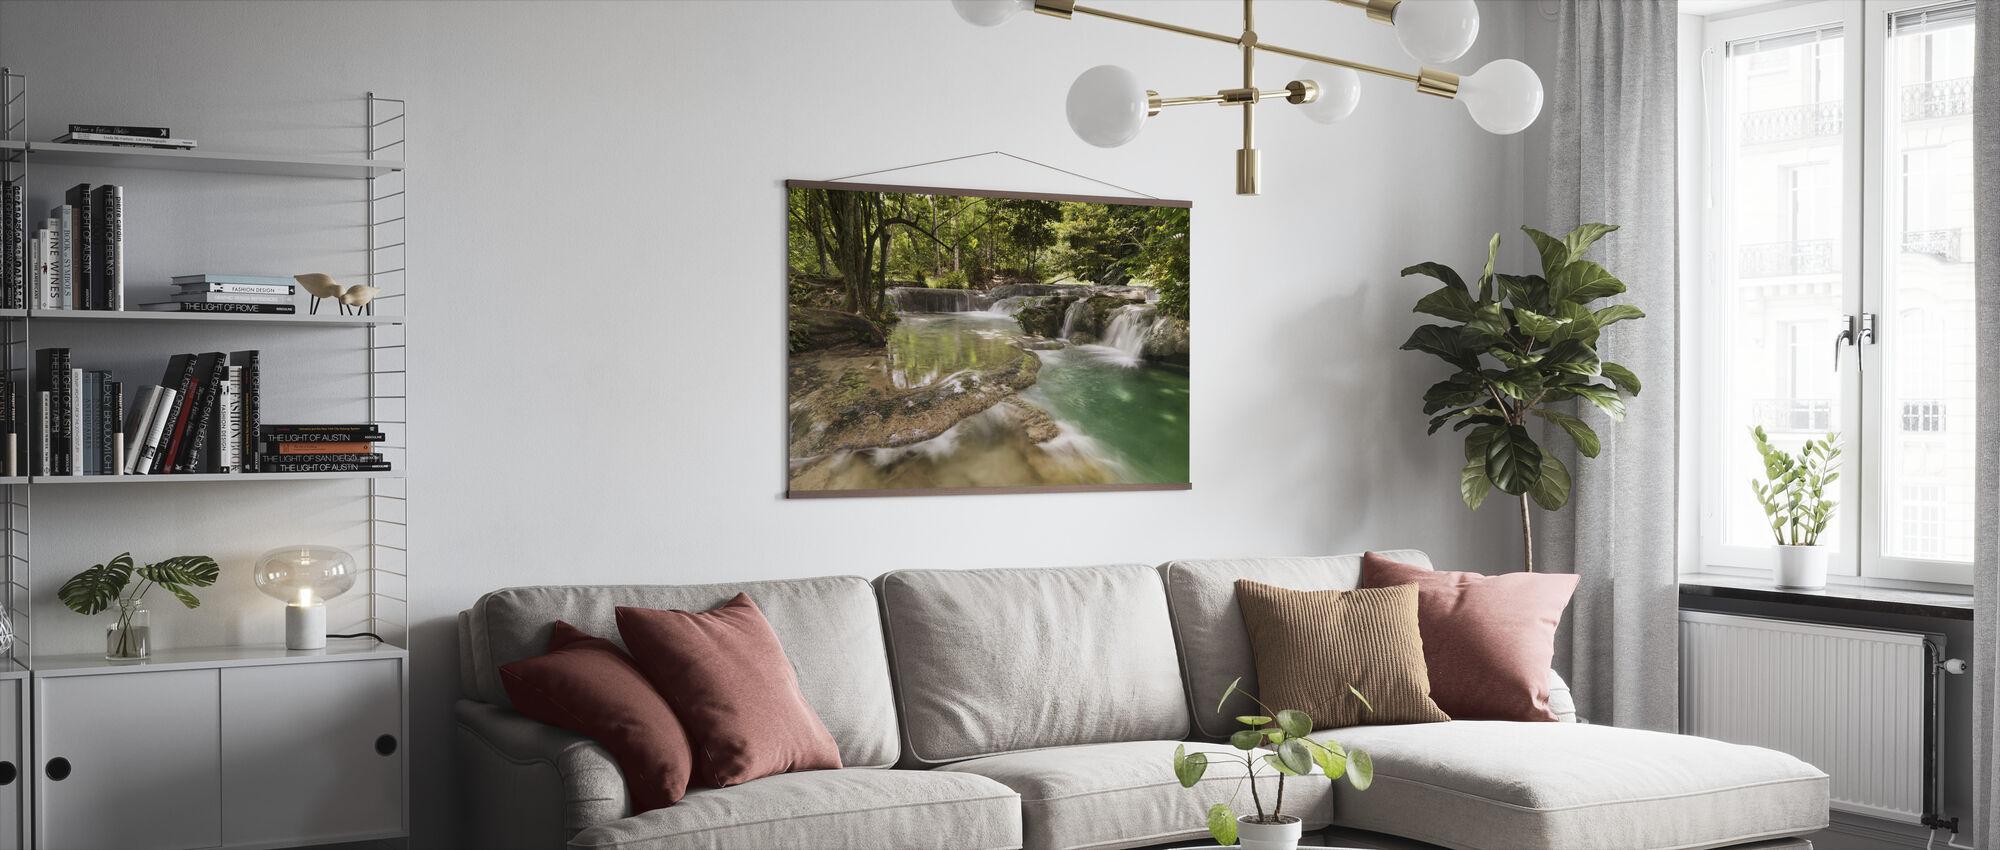 Panas Waterfalls II - Poster - Living Room